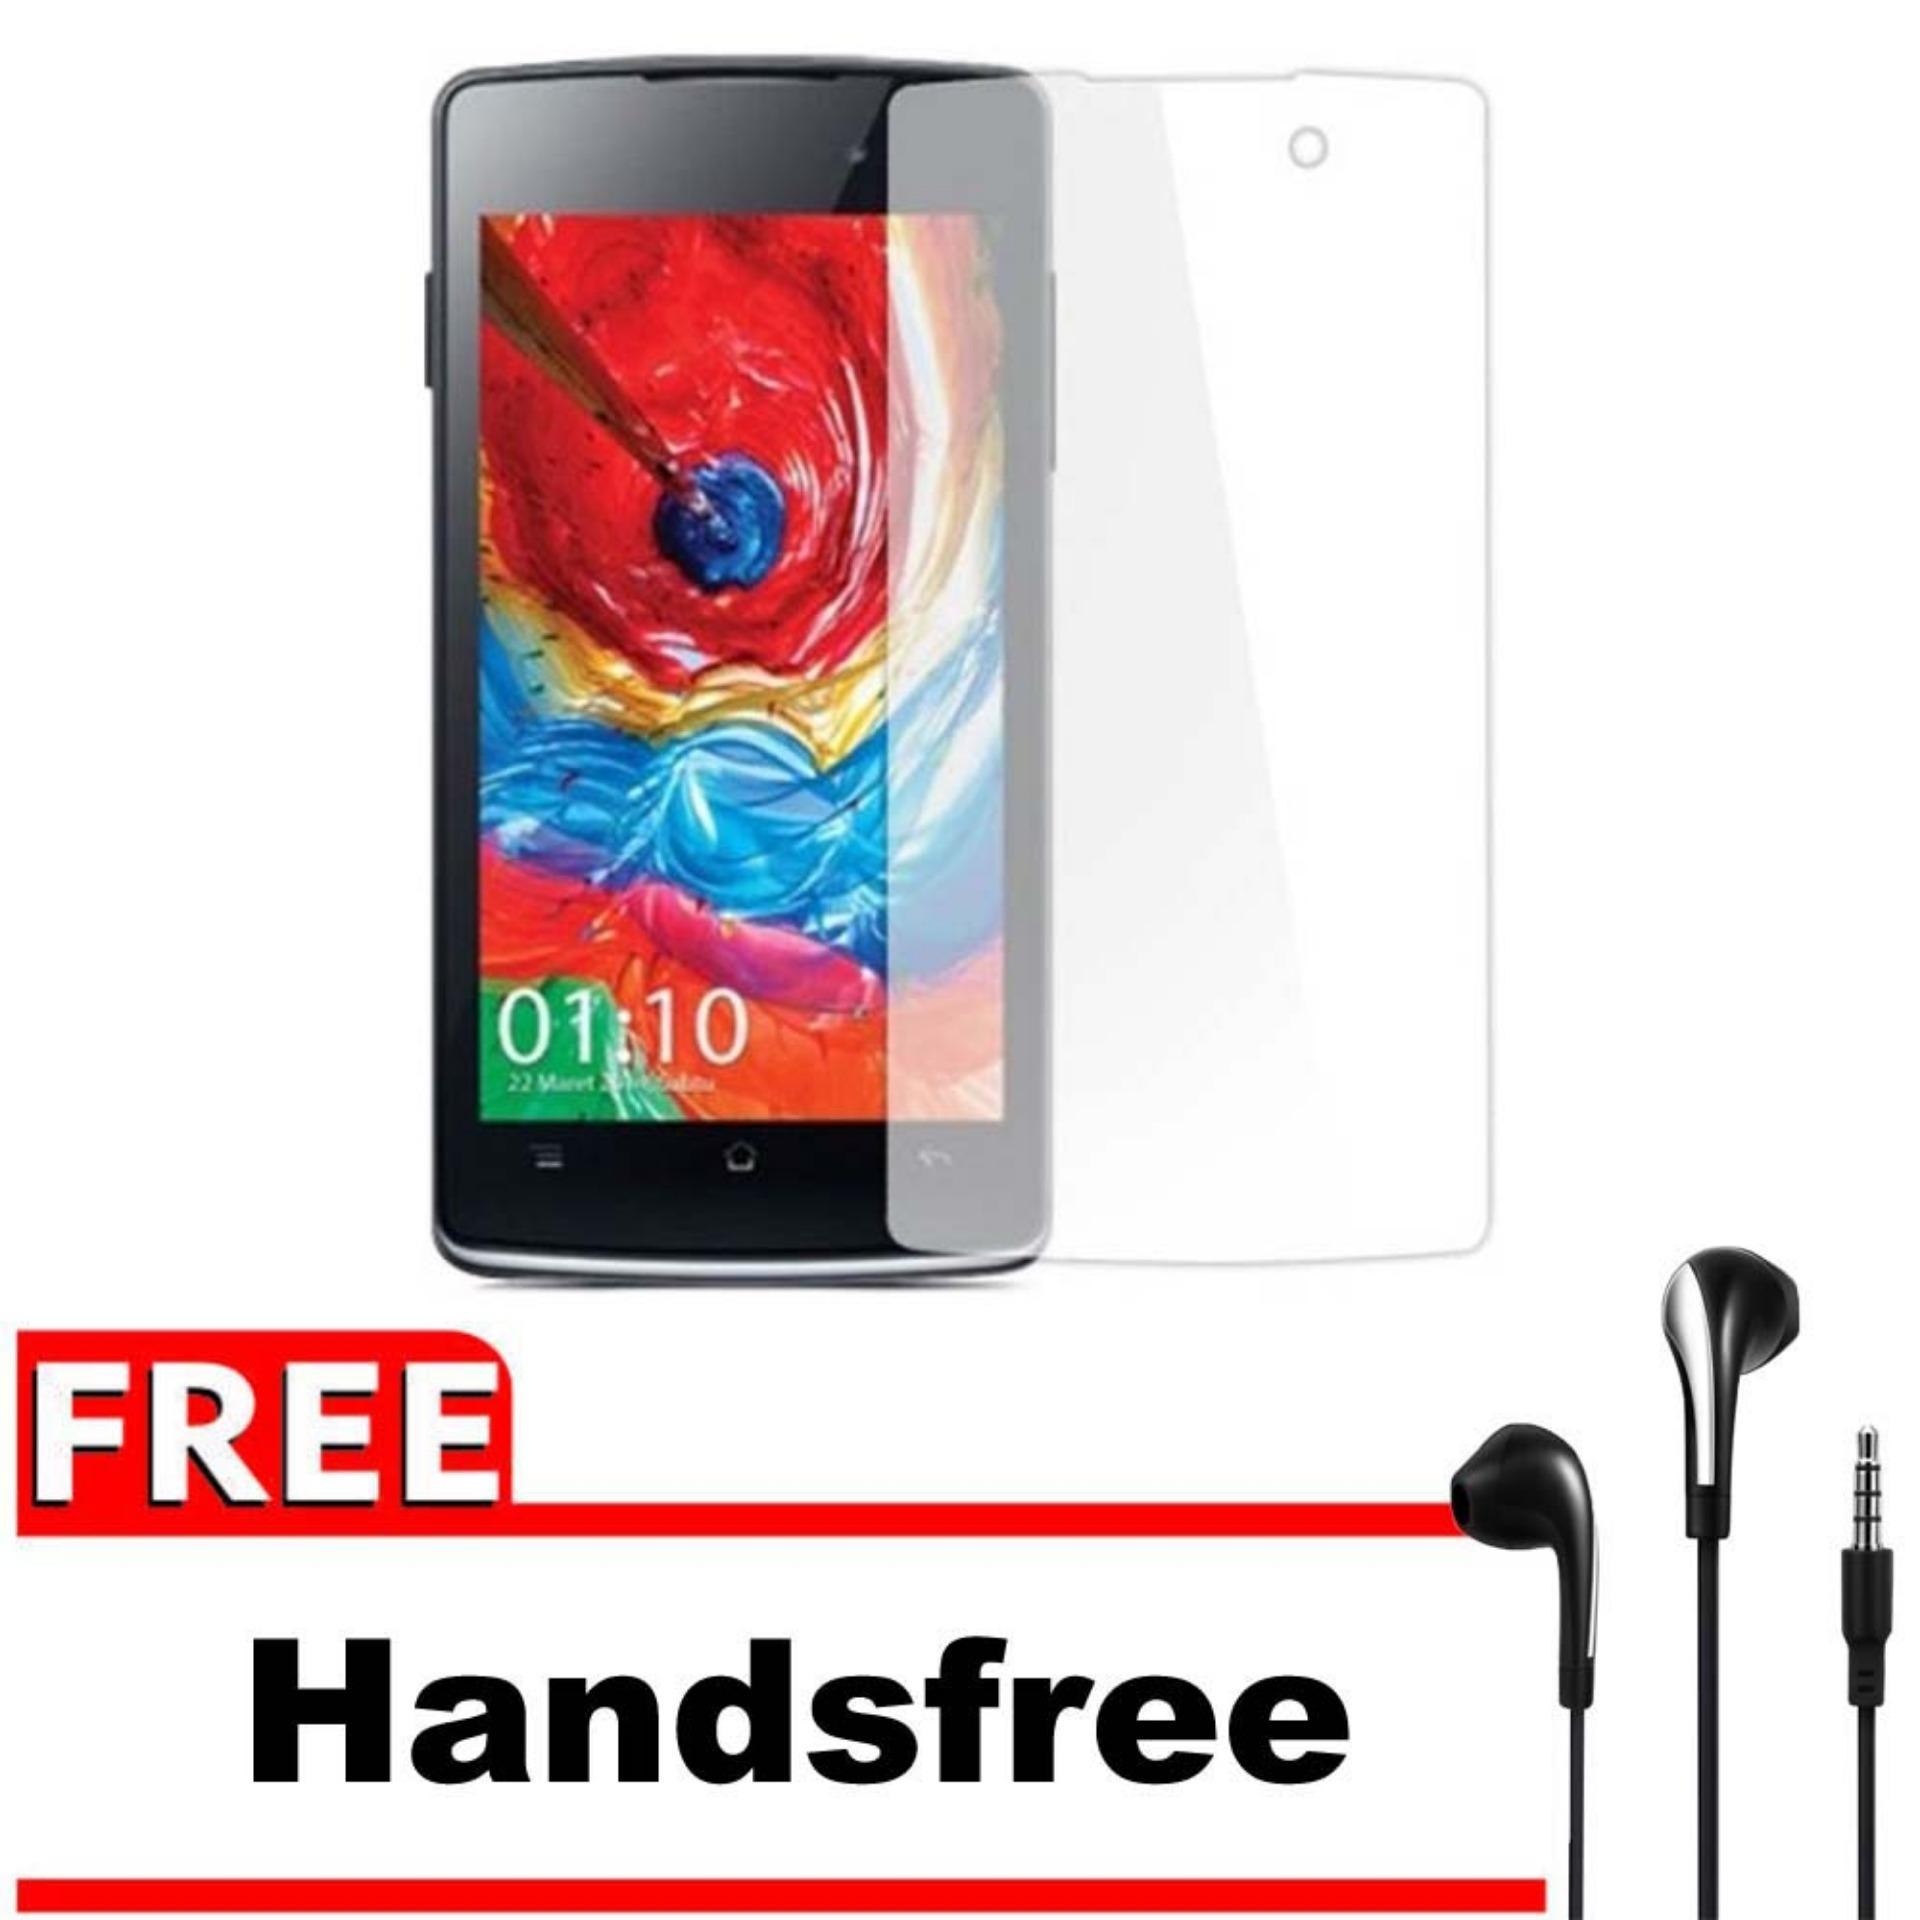 Vn Oppo Joy / R1001 Tempered Glass Screen Protector 0.32mm - Anti Crash Film + Gratis Free Handsfree Earphone Headset Universal - Bening Transparan